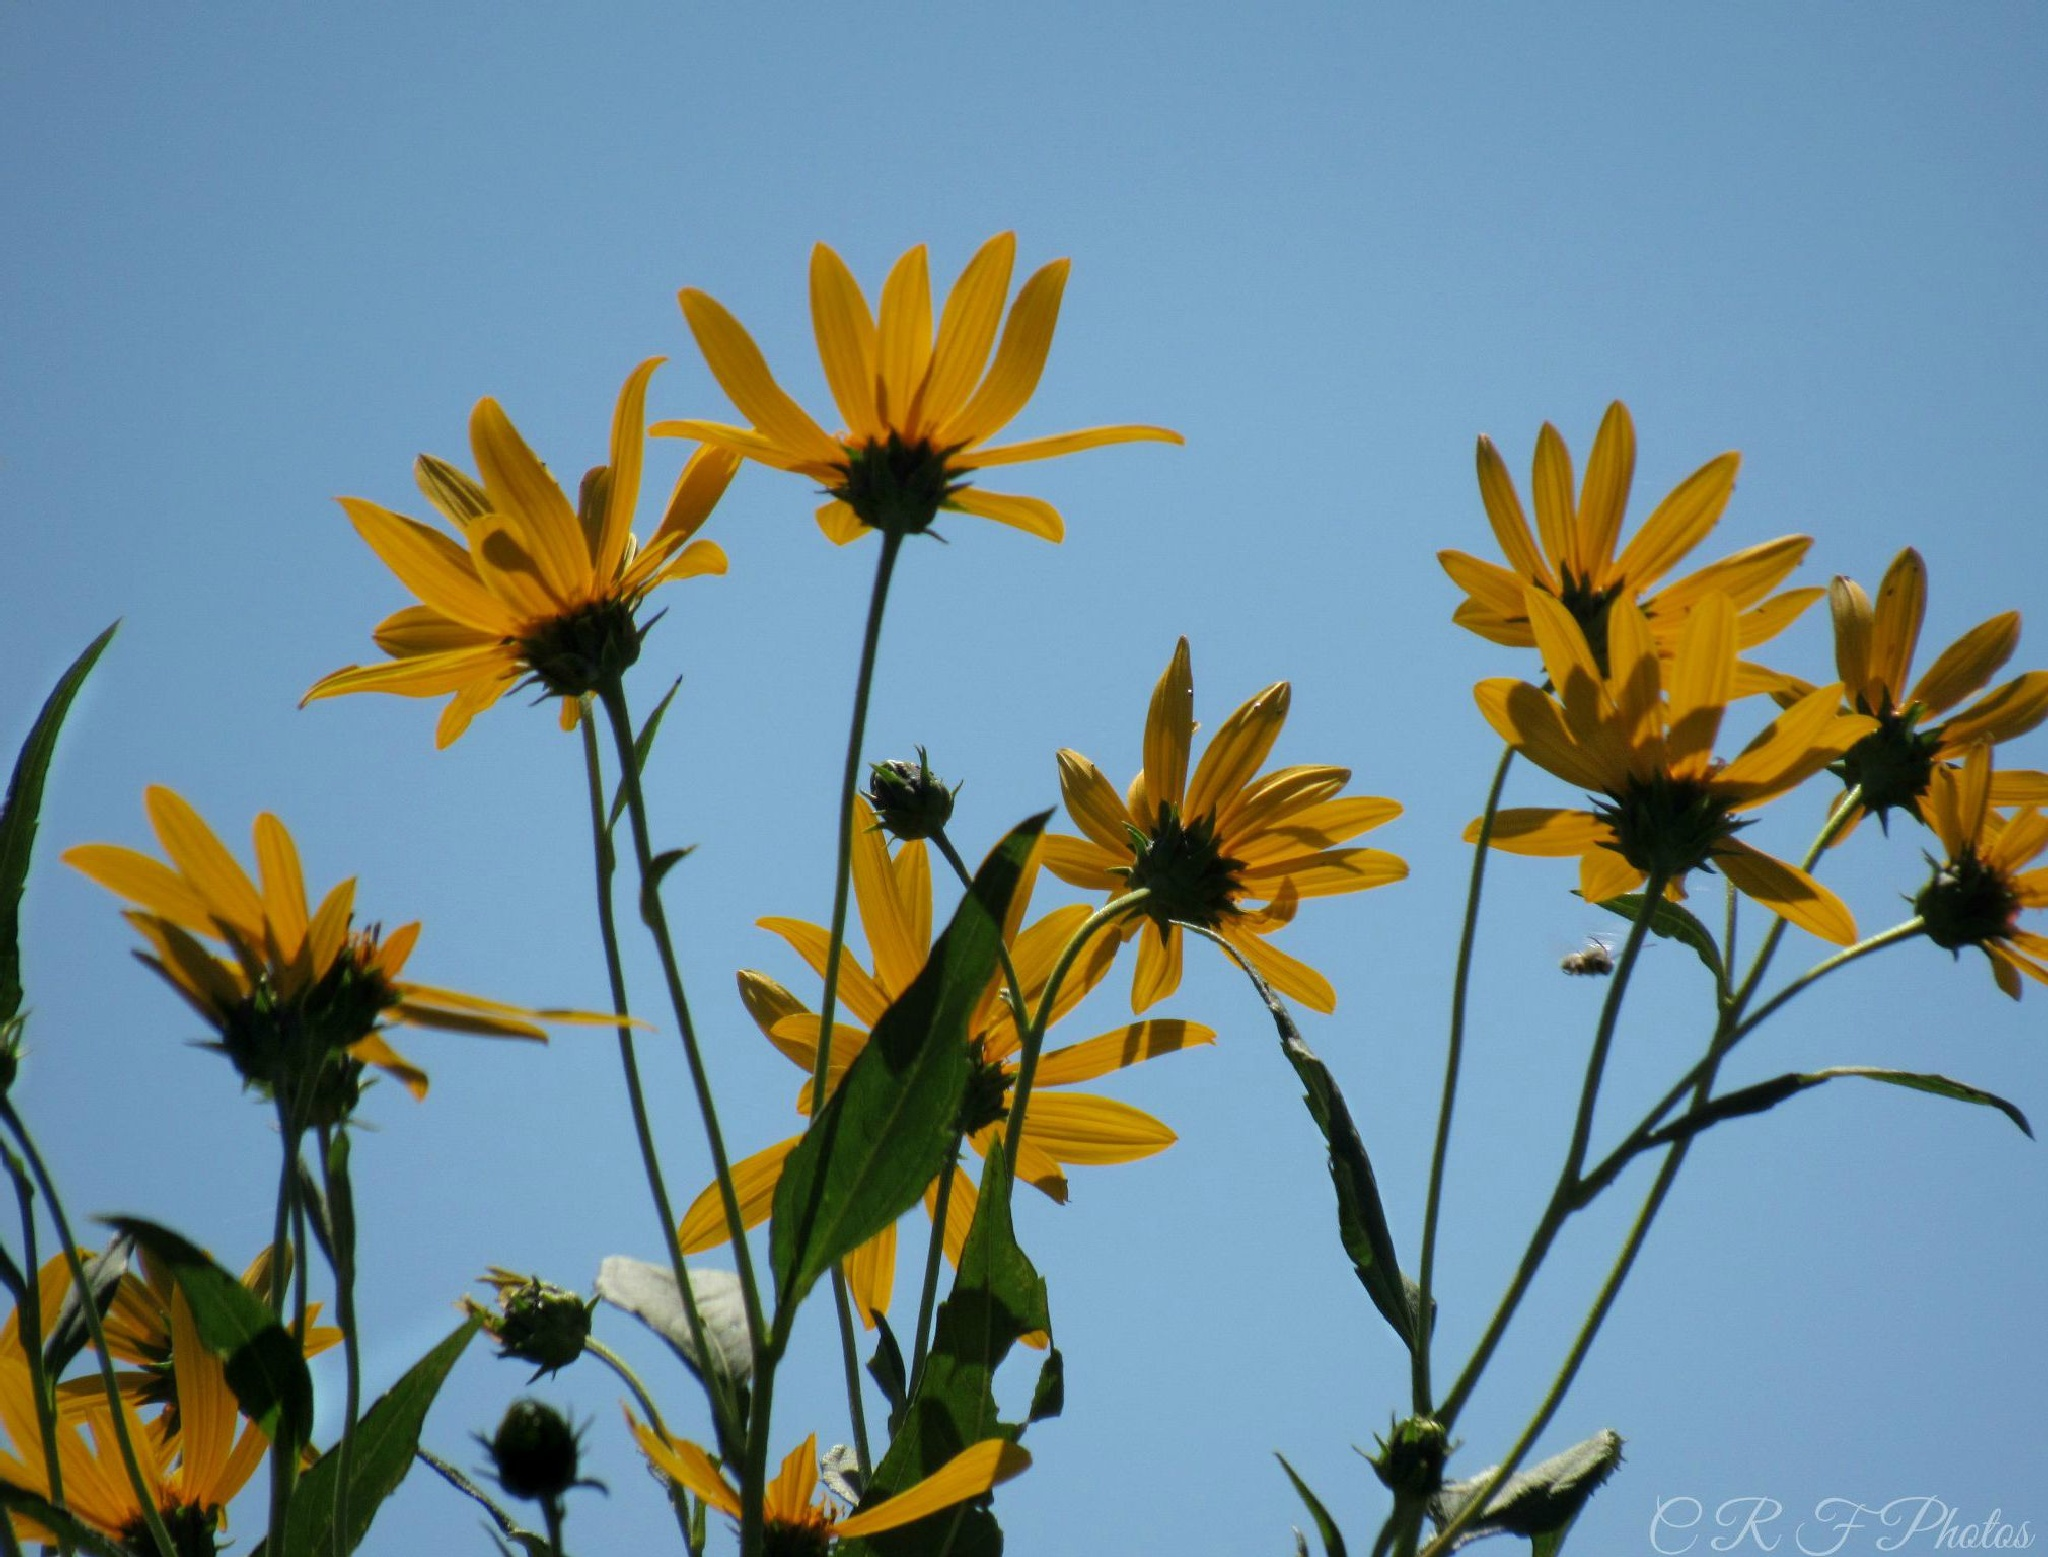 Wildflowers Against Blue Sky by fergusoncindy33